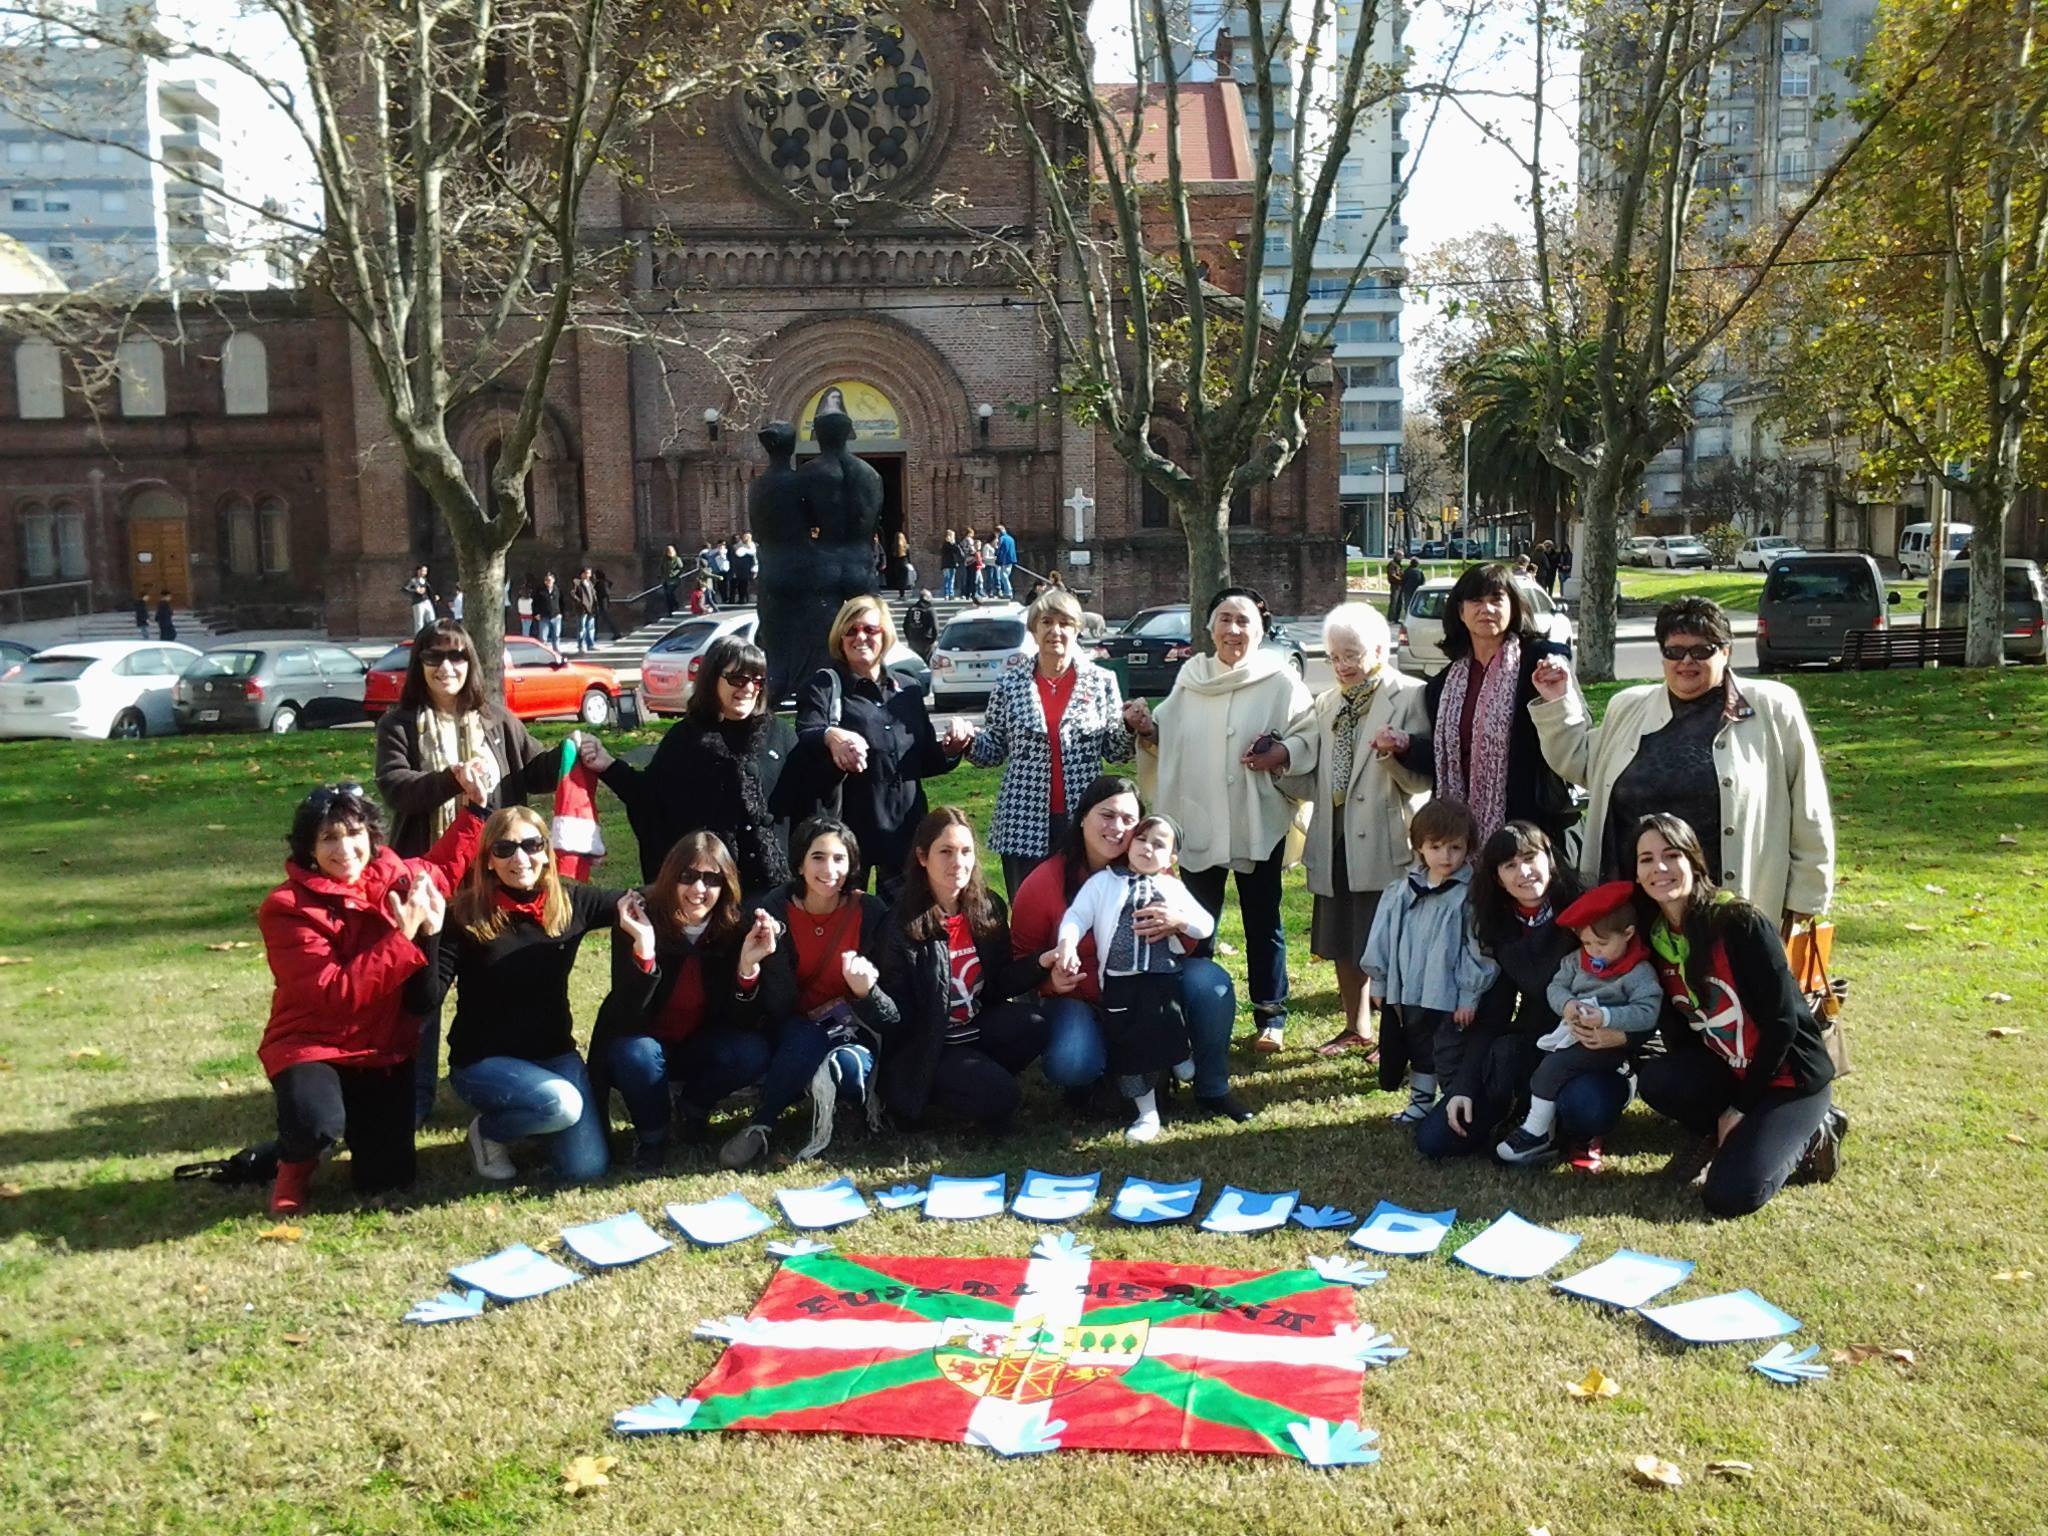 Integrantes del Lagun Onak pergaminense participando de la Cadena Humana 'Gure Esku Dago', en la Plaza Merced de la ciudad